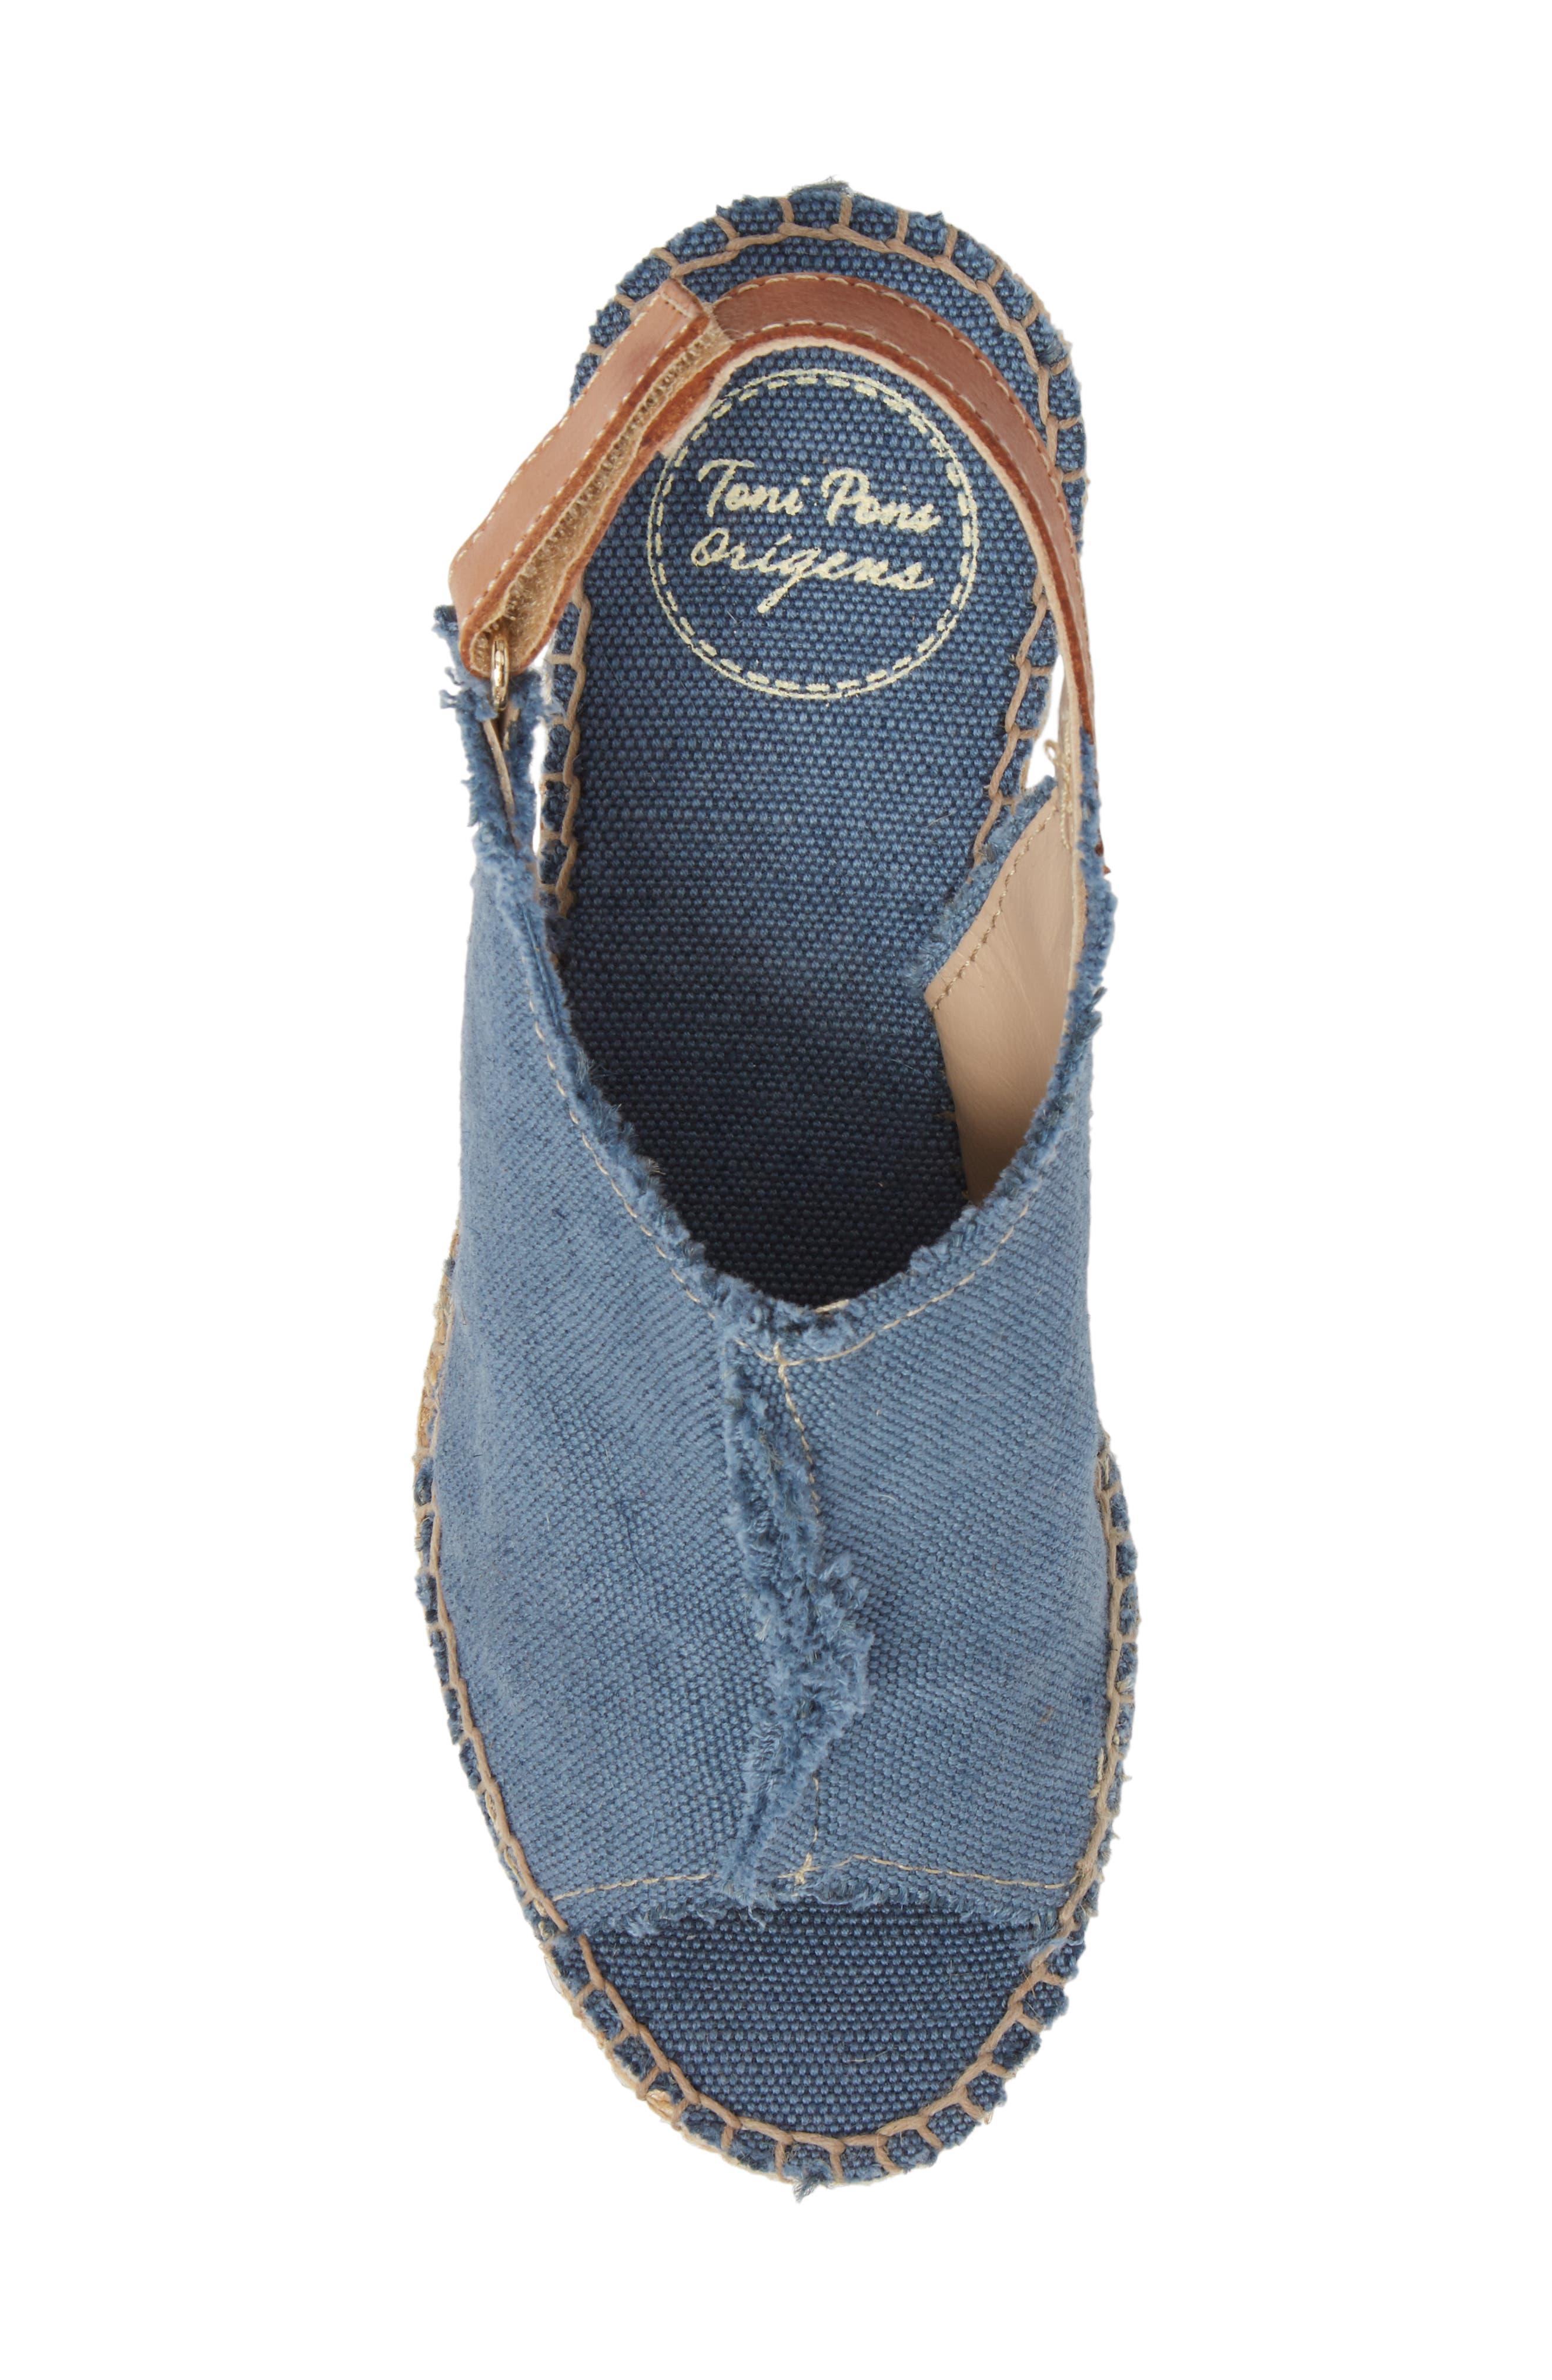 'Lugano' Espadrille Wedge Sandal,                             Alternate thumbnail 5, color,                             Blue Fabric